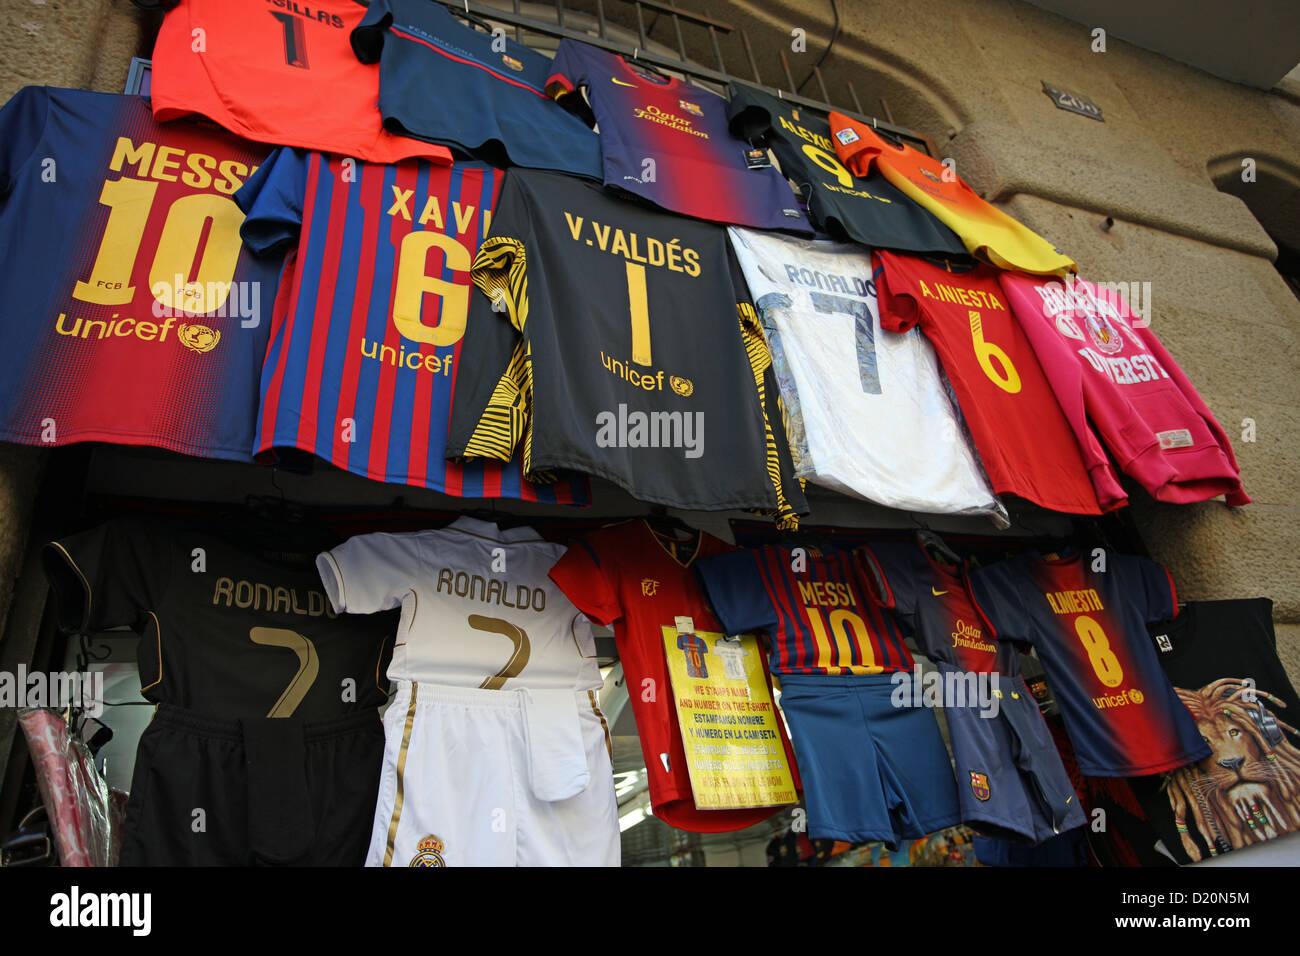 Barcelona Football Club shirts outside a shop in Barcelona Spain - Stock Image